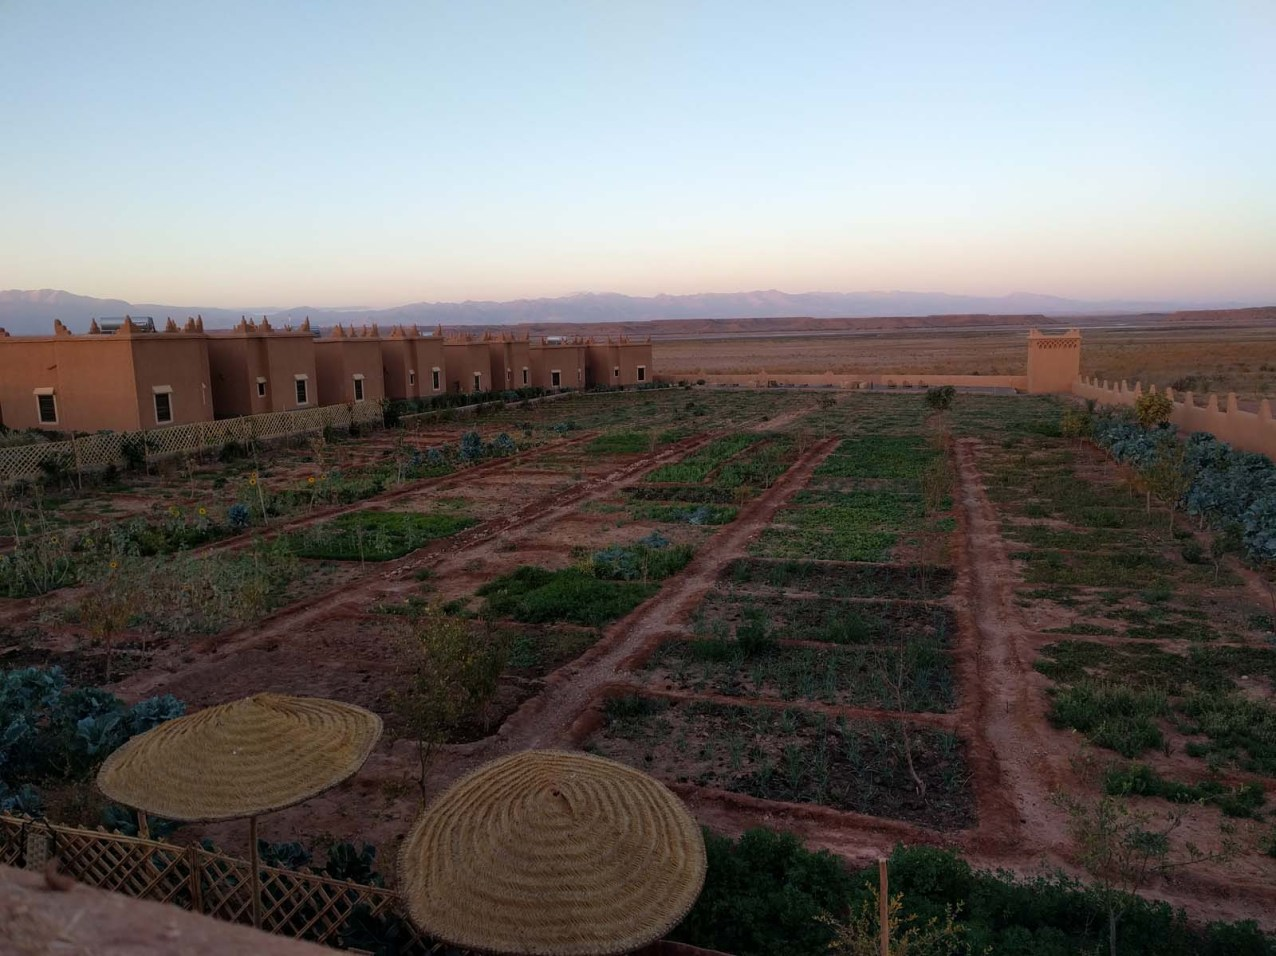 Giardino e bungalows nella nostra ecolodge a Ouarzazate